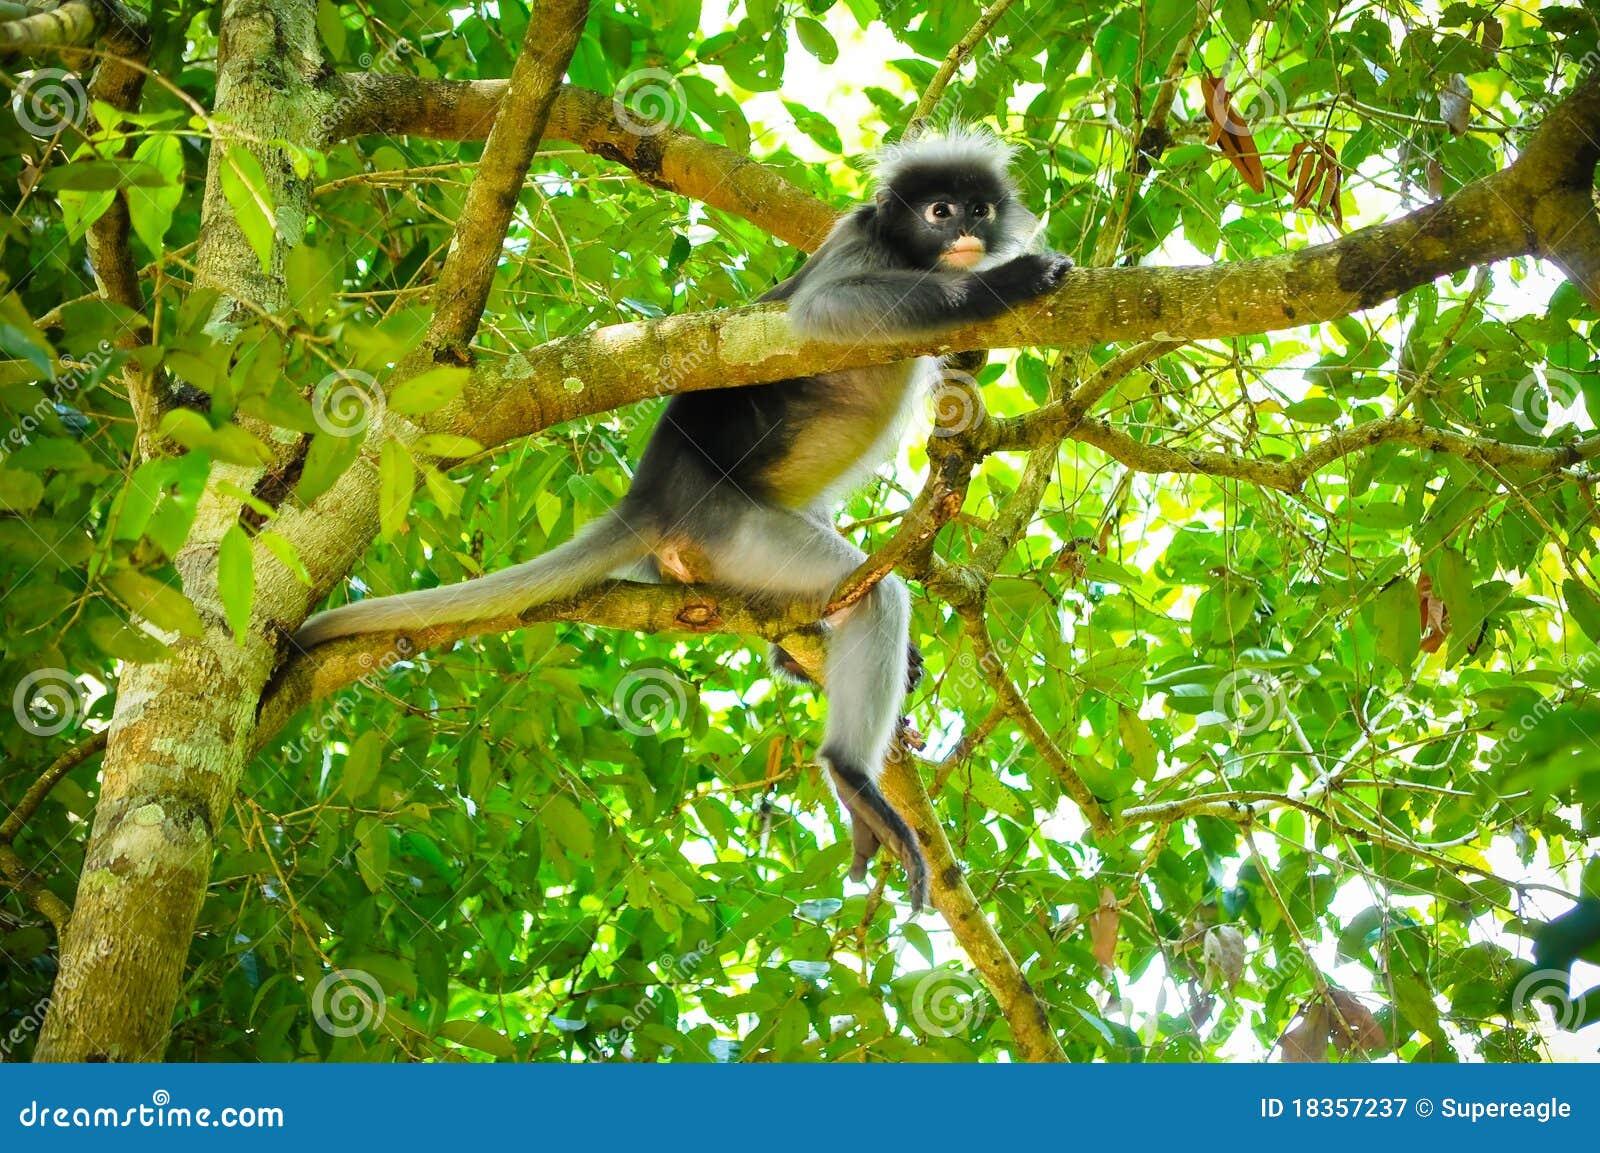 Monkey On The Tree Royalty Free Stock Photography - Image: 18357237